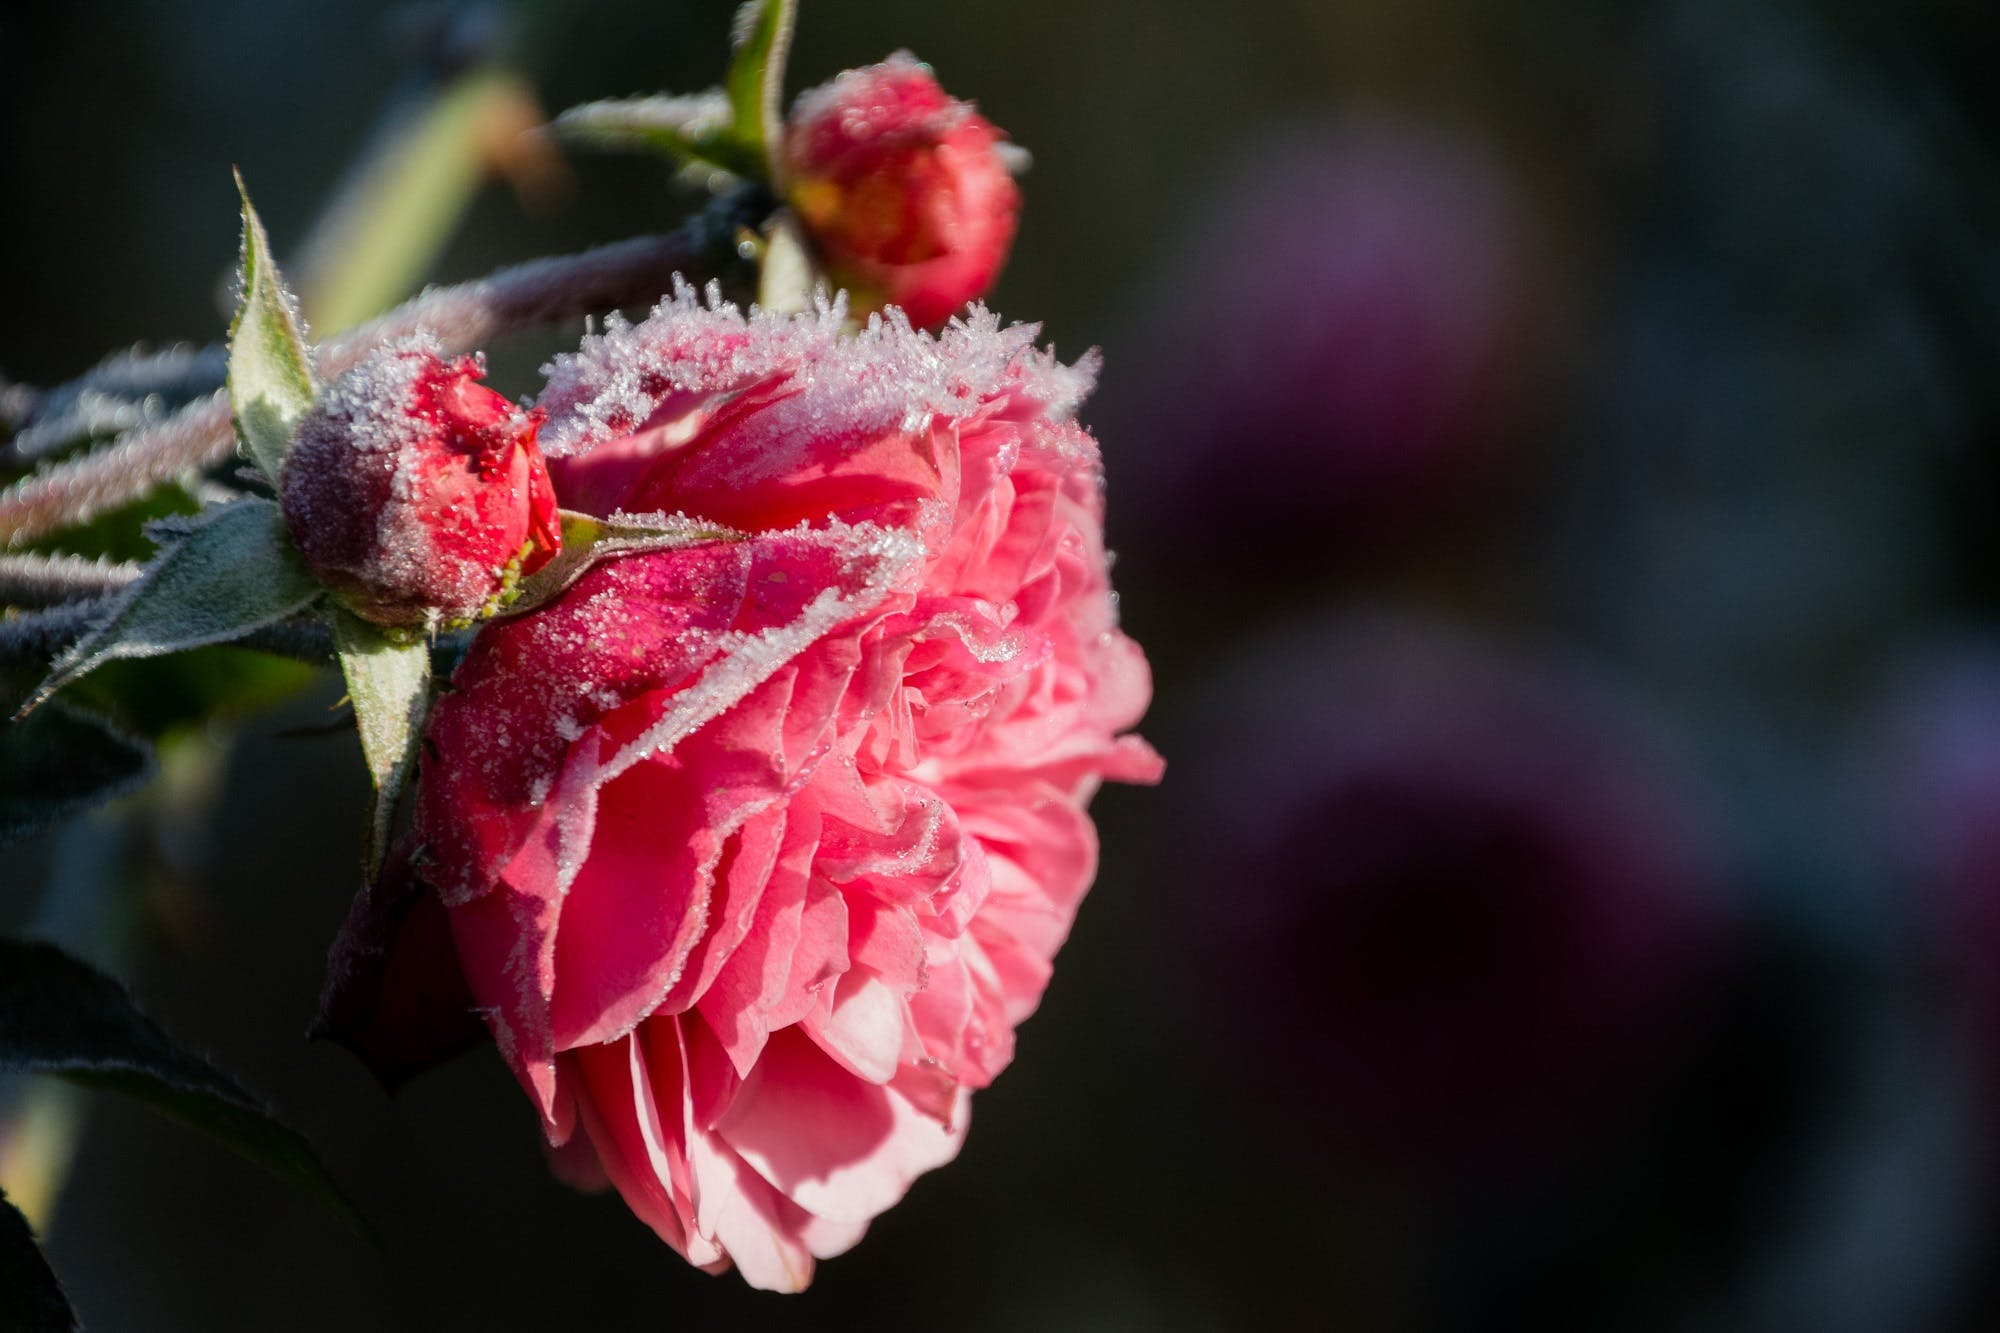 Red Flower on Macro Shot